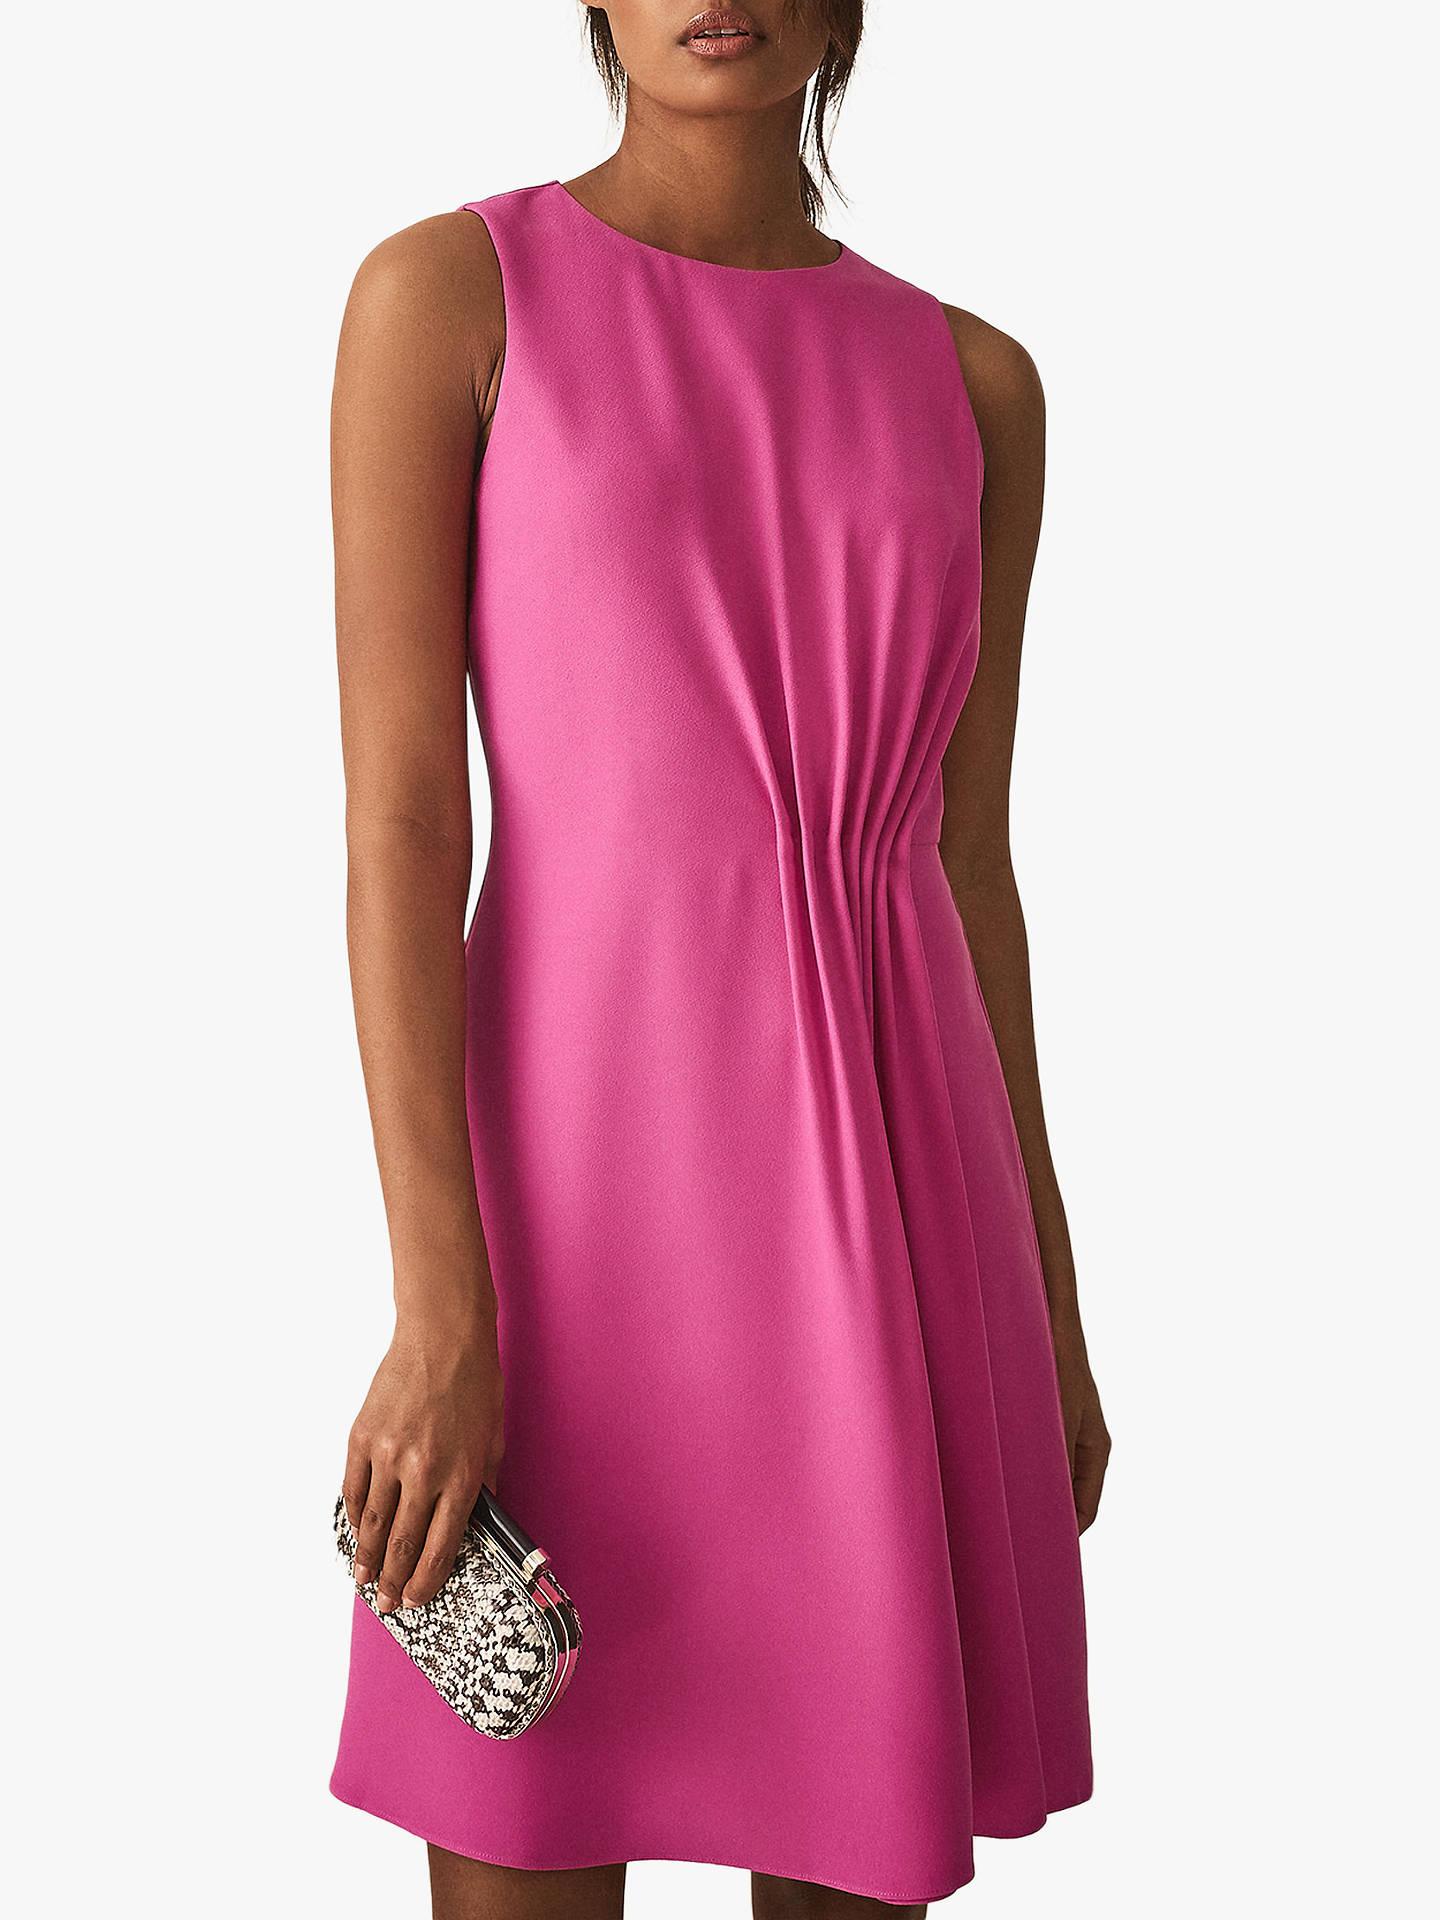 Reiss Nadia Pleat Detail Dress, Pink at John Lewis & Partners